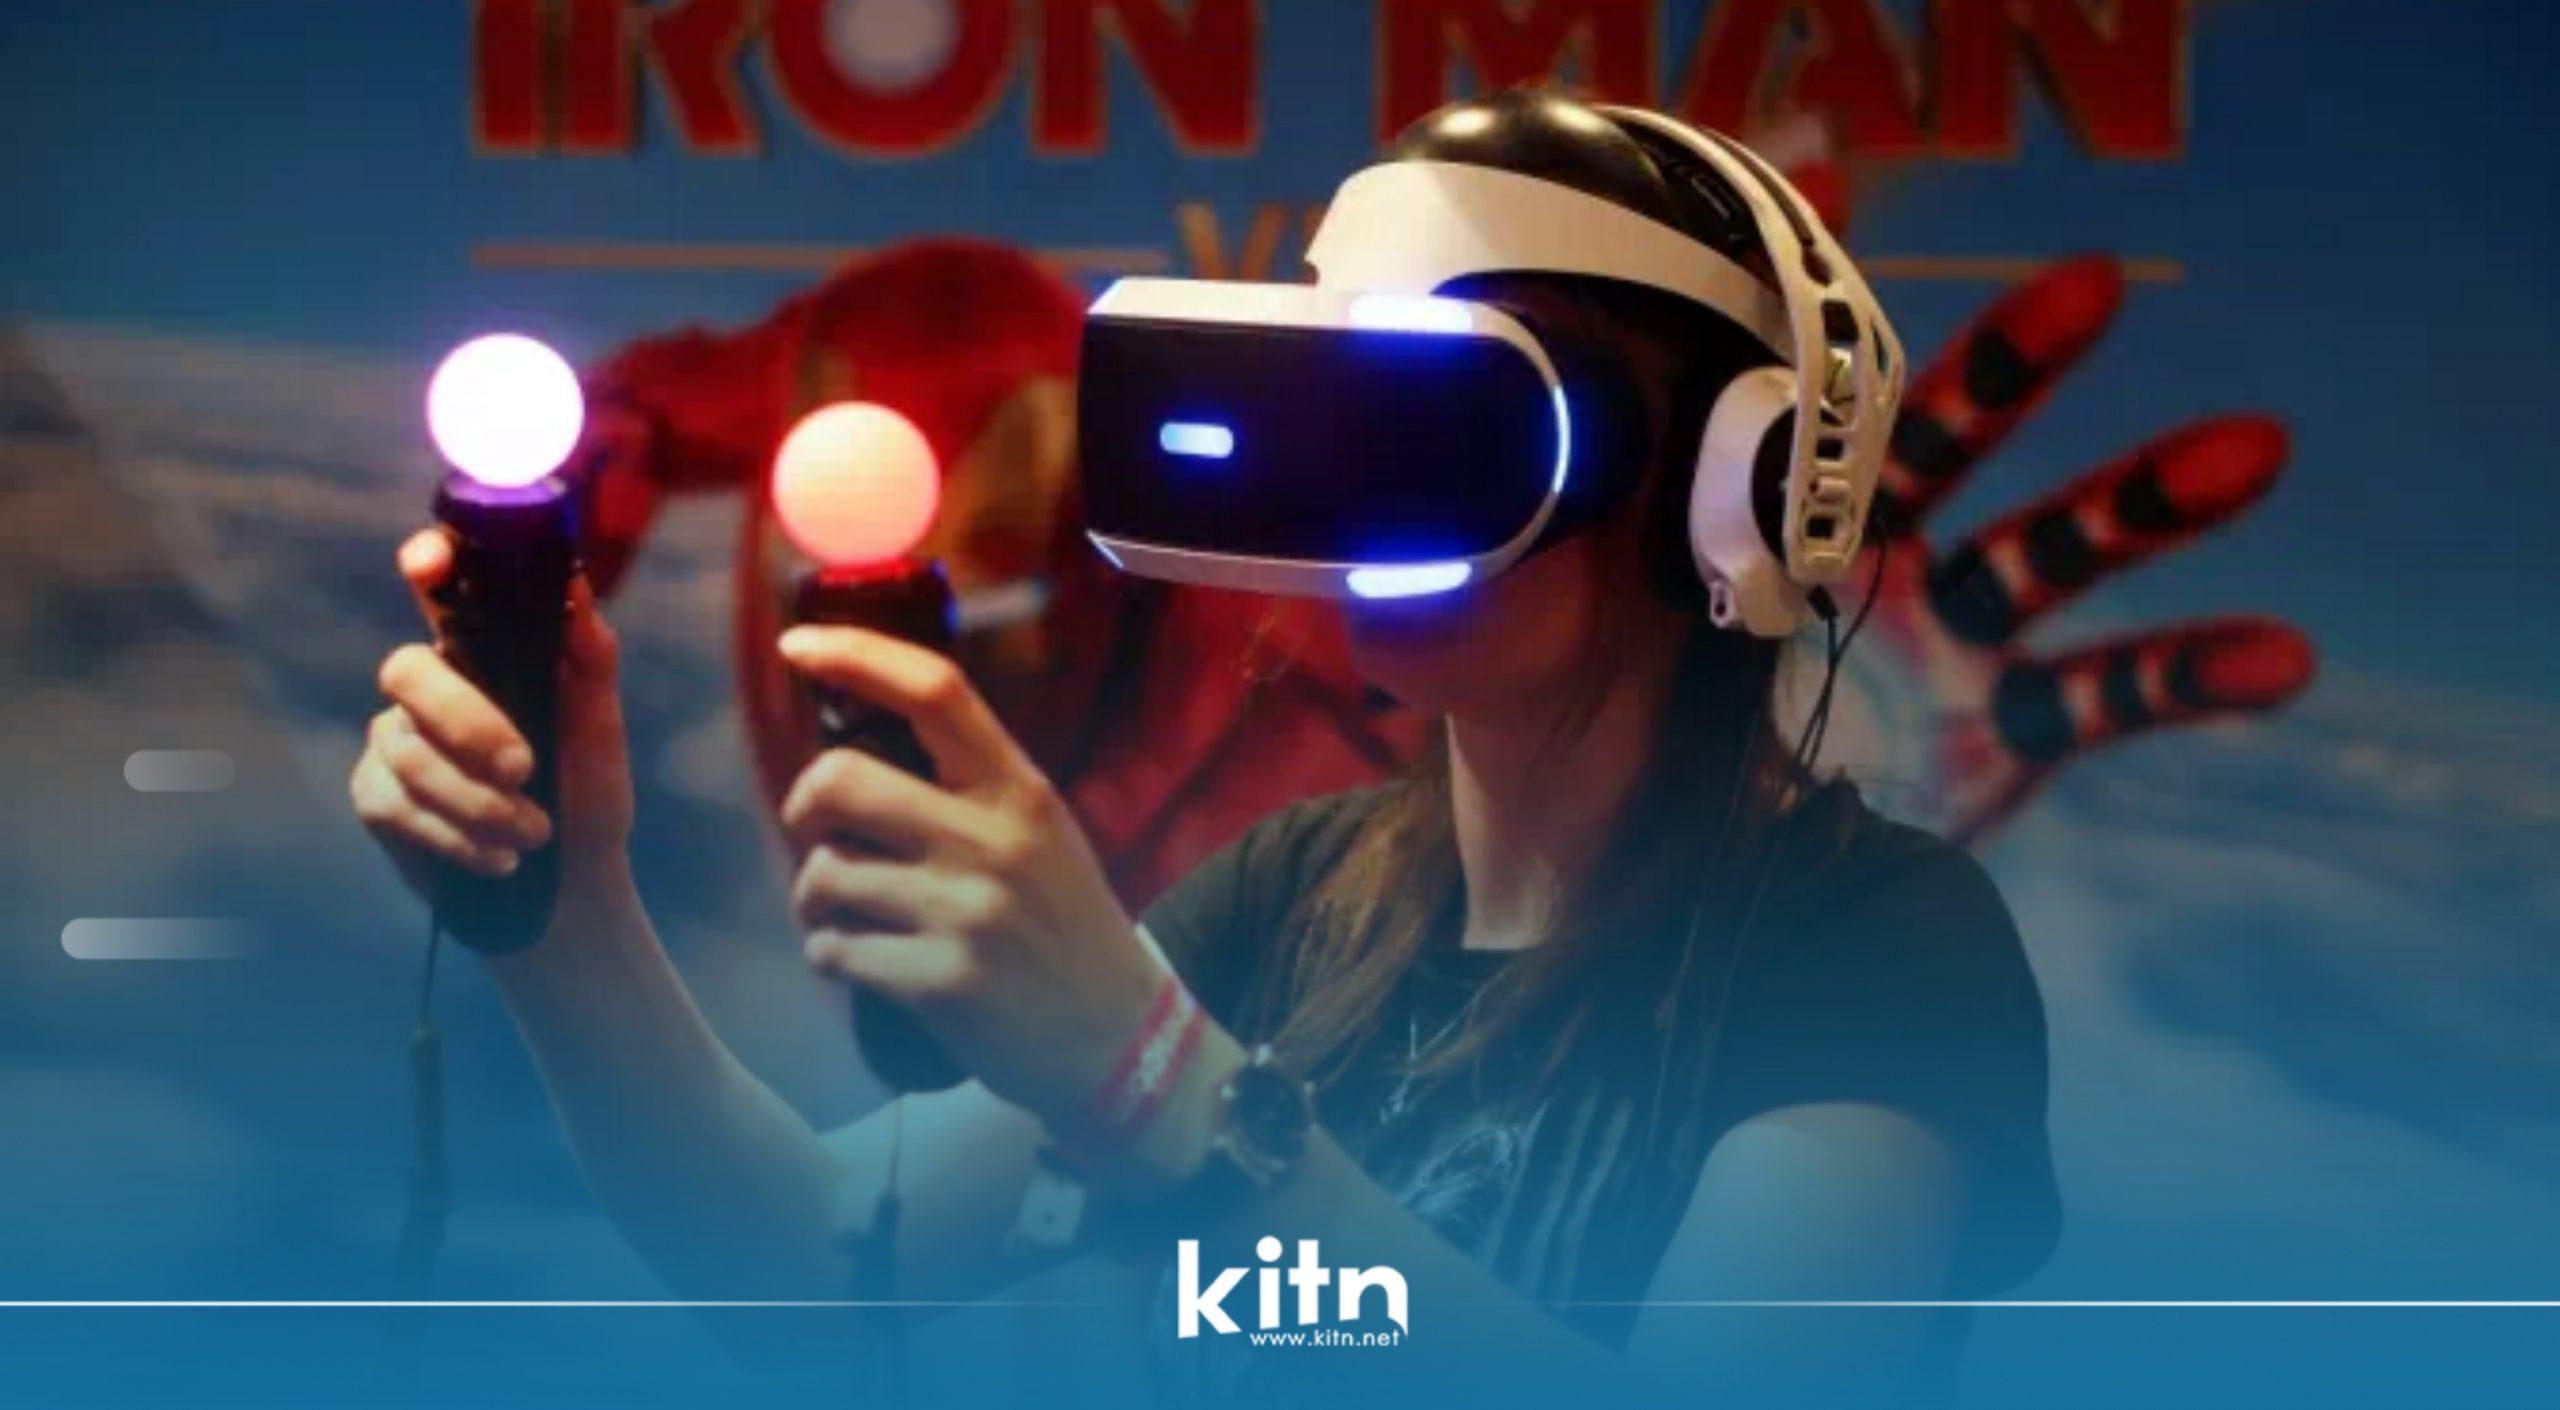 سۆنی کار لەسەر هێدسێتی نوێی پلەیستەیشن VR دەکات بۆ پلەیستەیشن 5